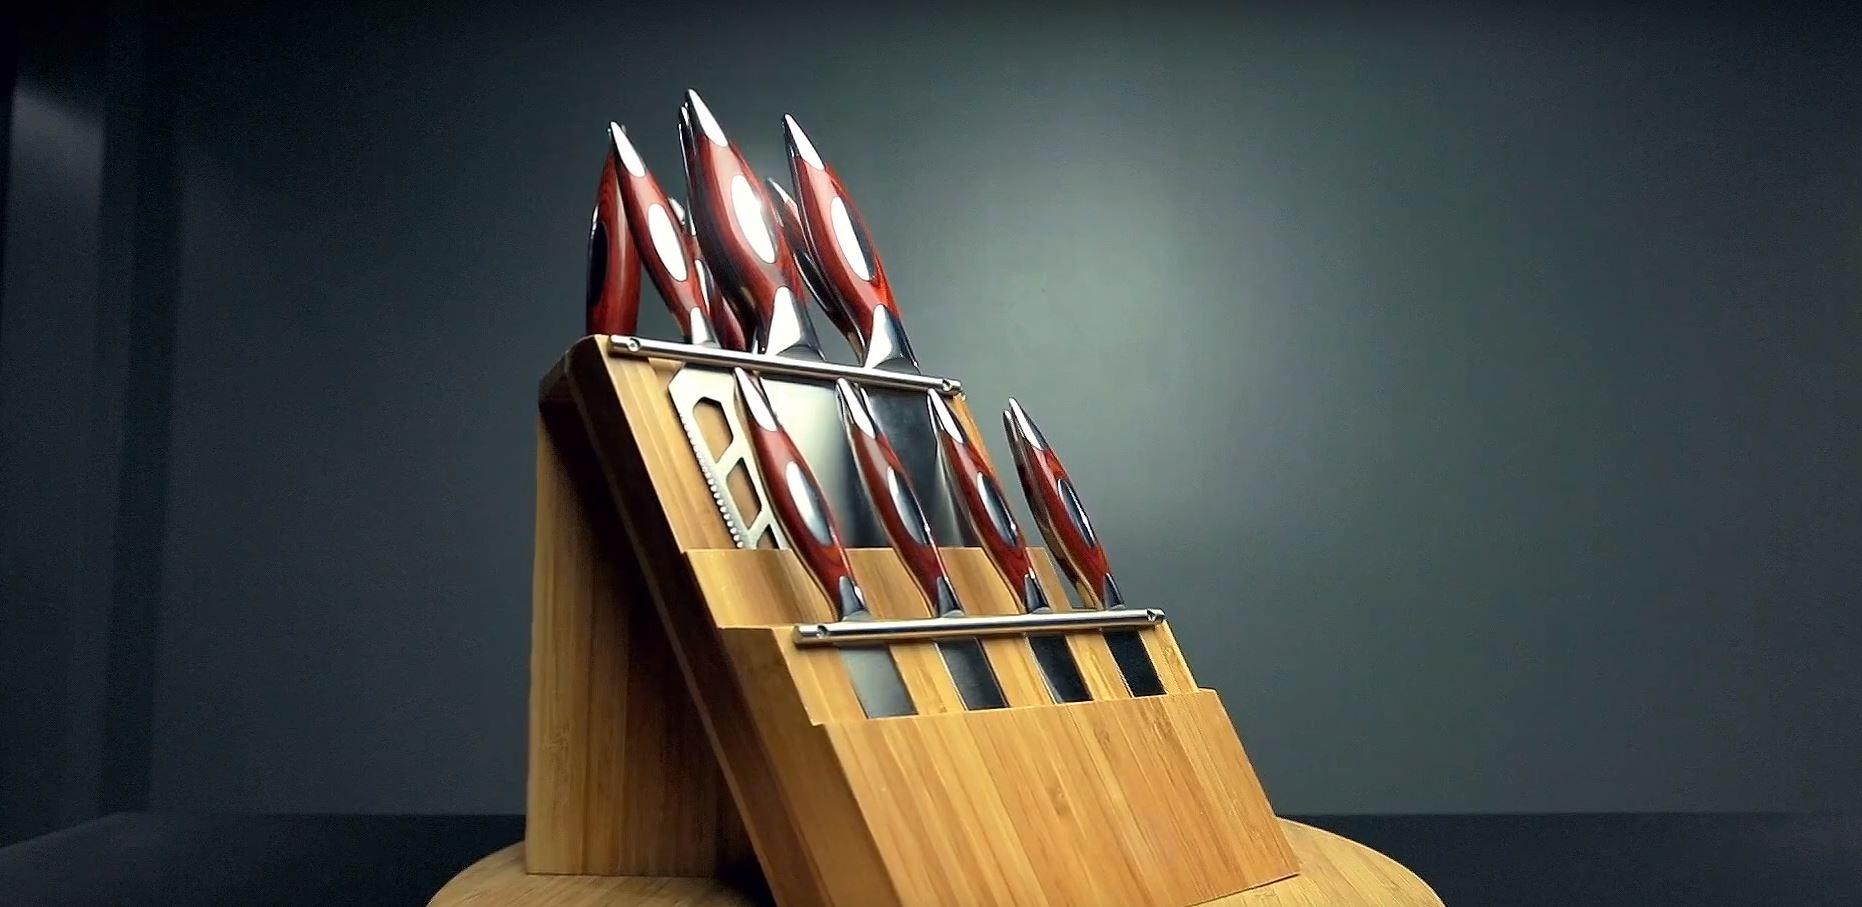 Rhineland Cutlery Knife for Life Video